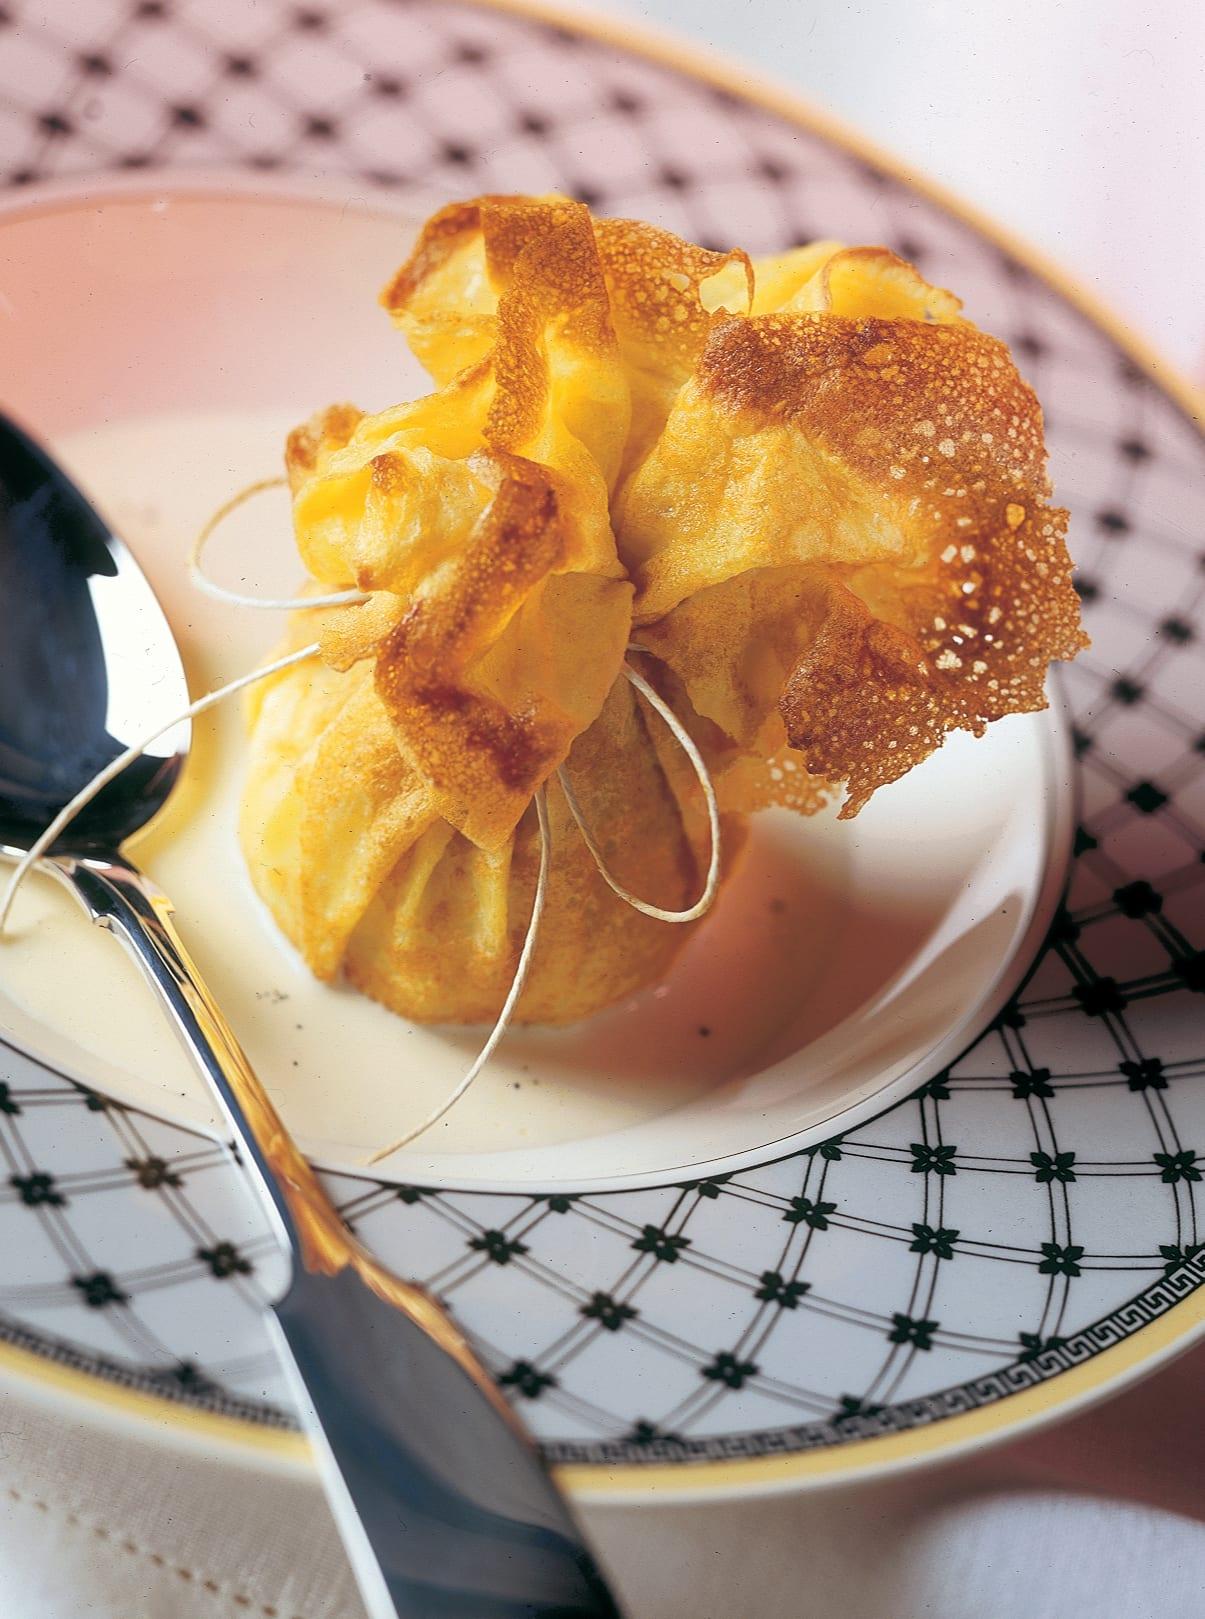 Crêpes-Beutel mit Apfelfüllung